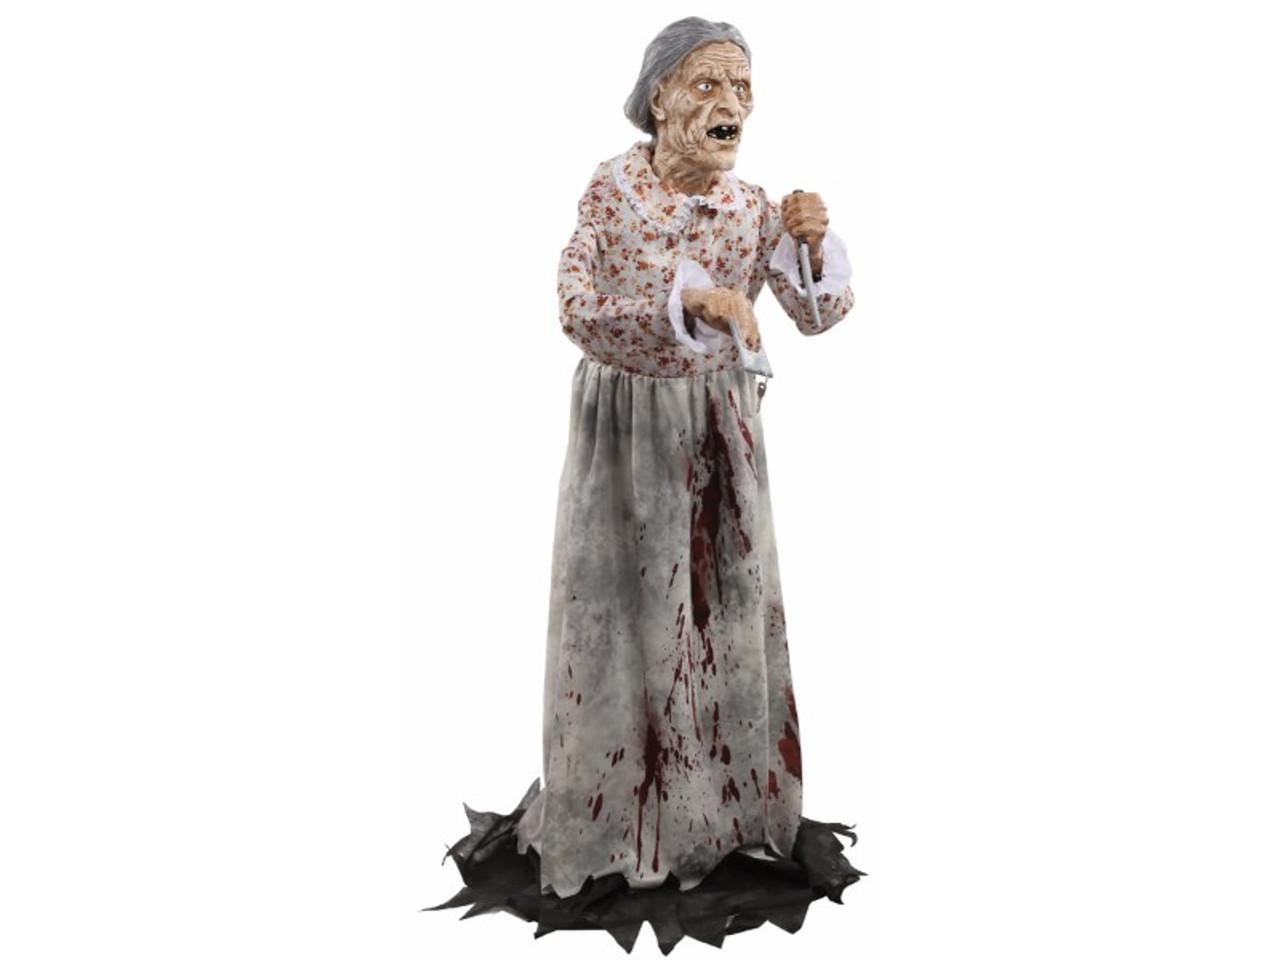 Bates Motel Props 5 Foot Lifesize Static Granny Psycho